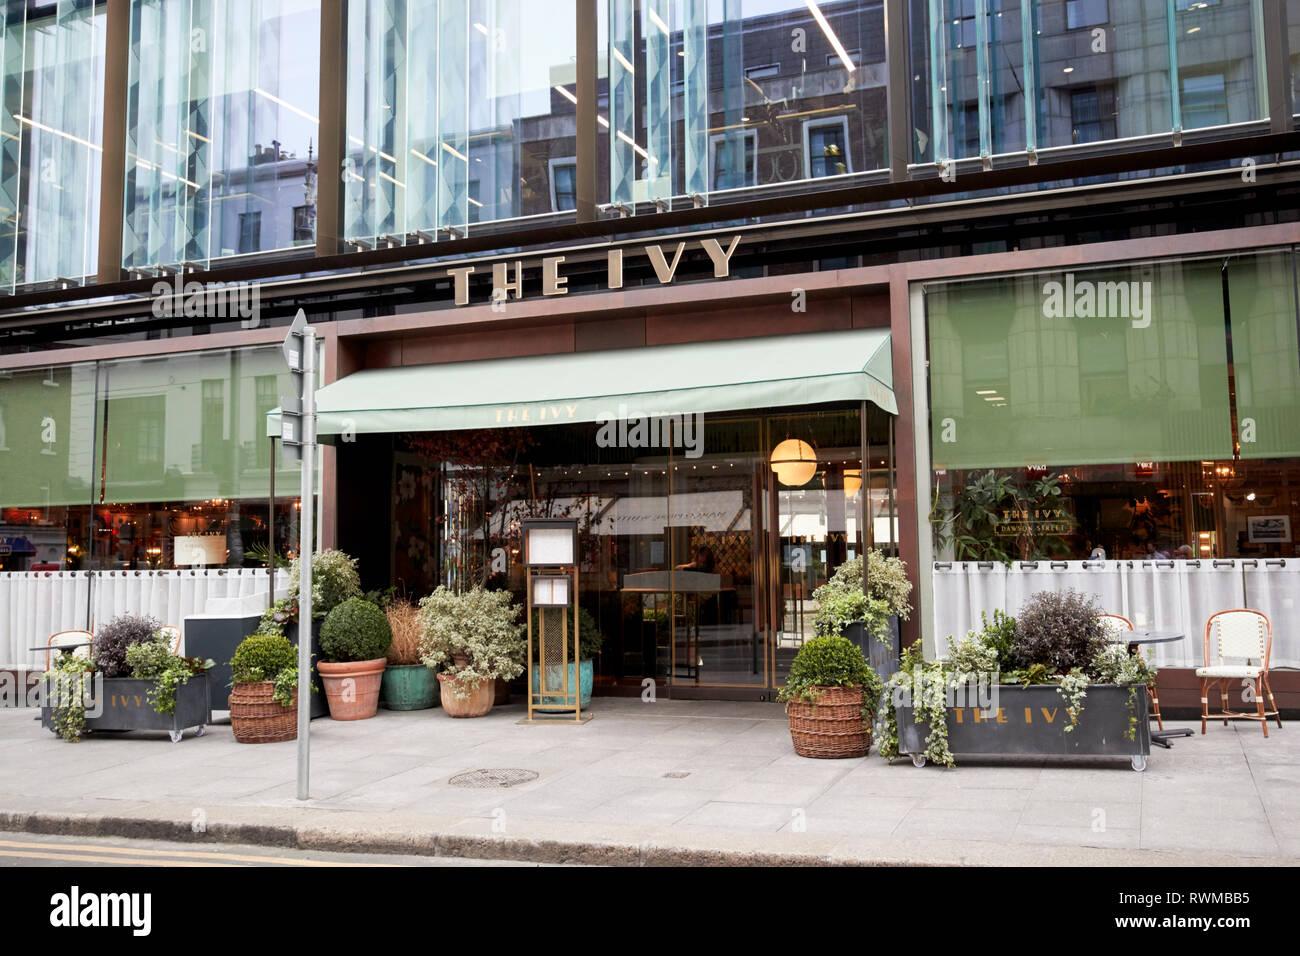 The Ivy restaurant dawson street Dublin republic of Ireland - Stock Image